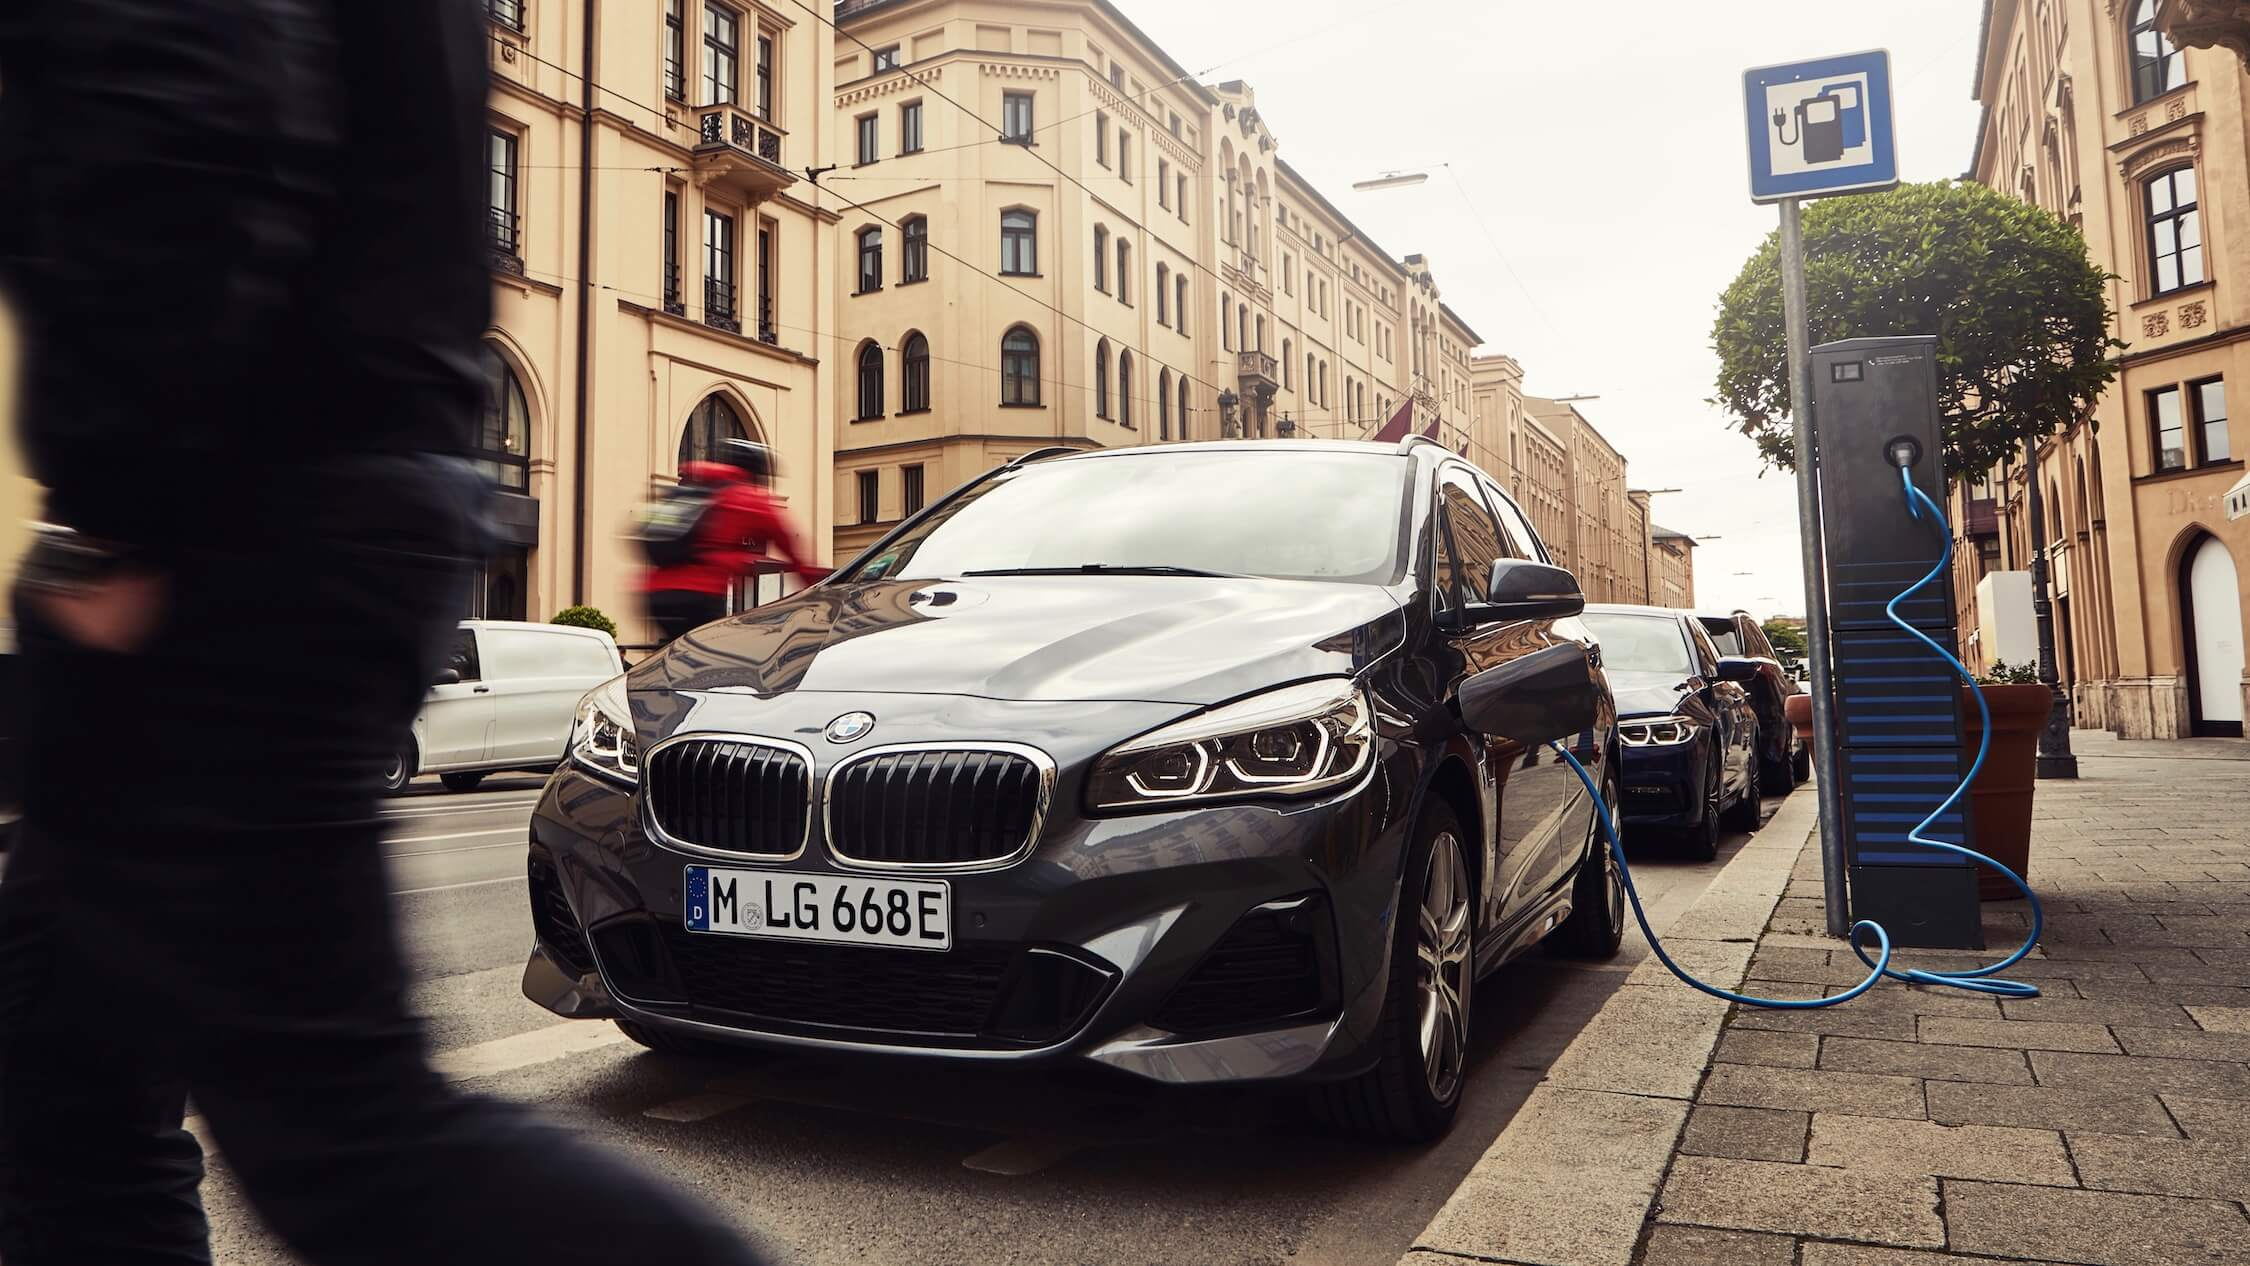 hybride BMW 225xe opladen